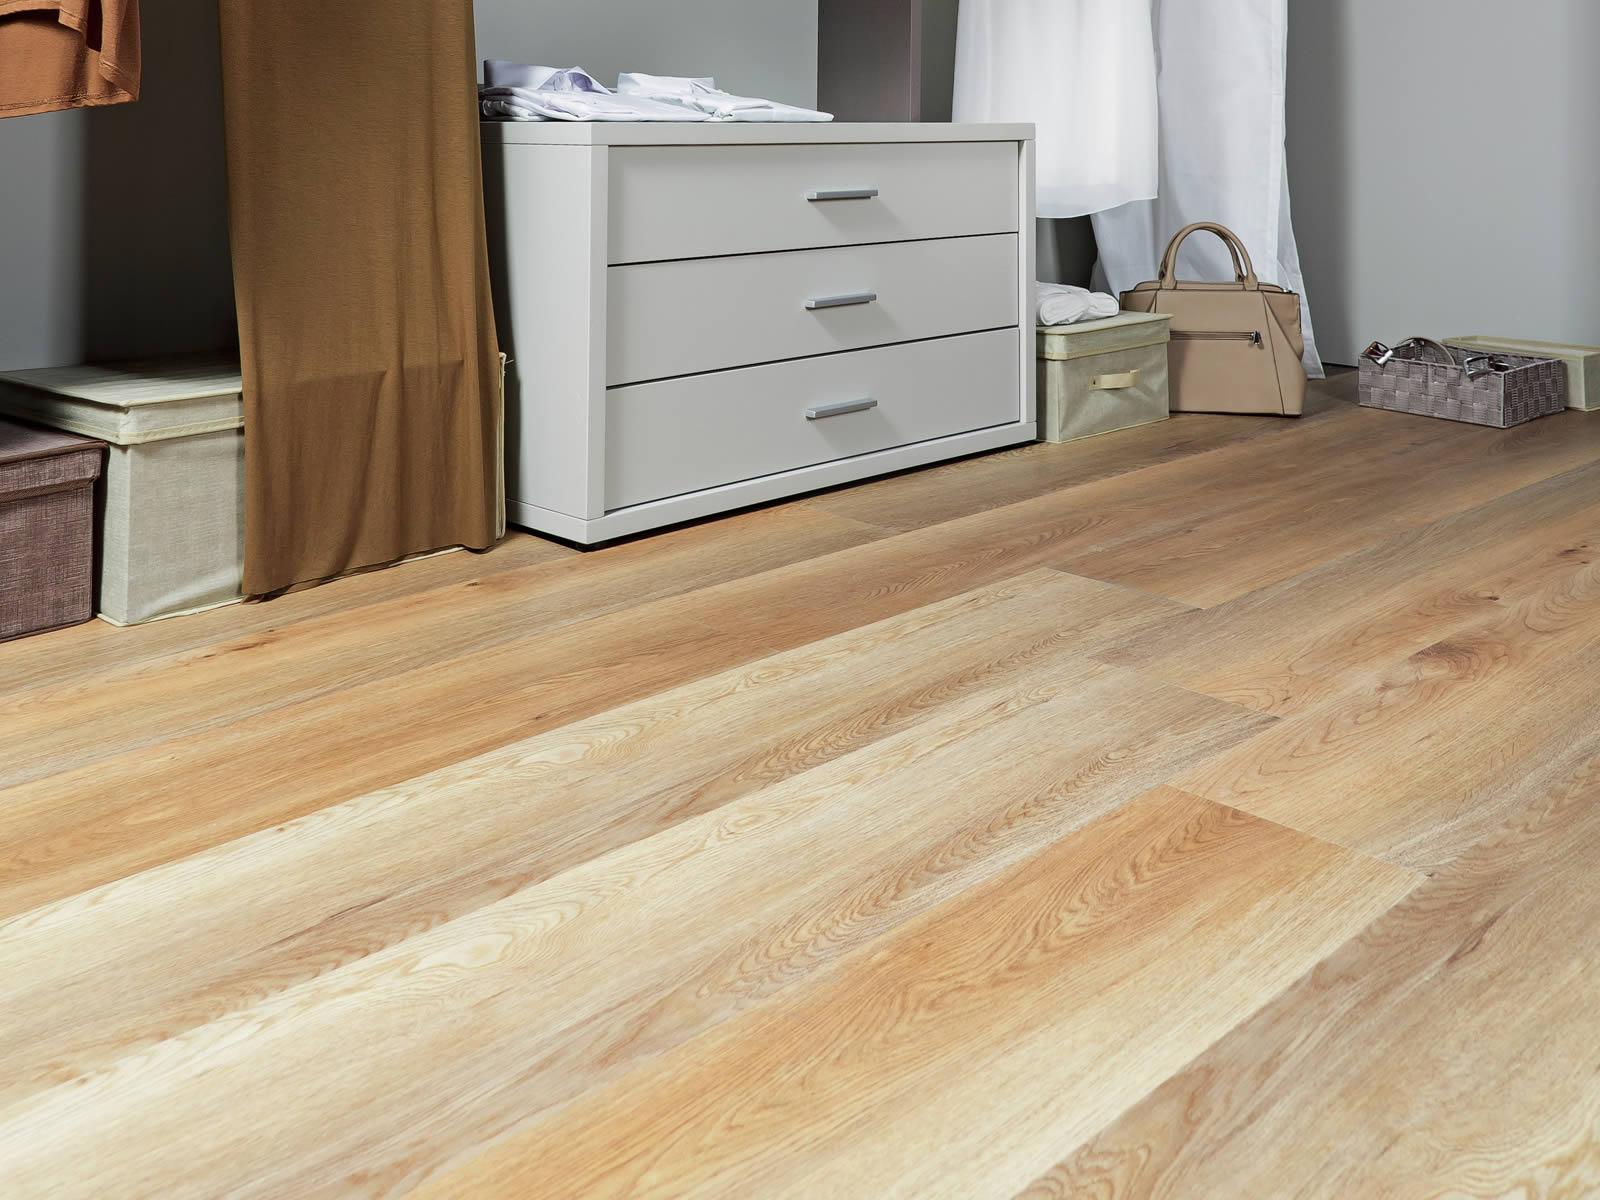 beki-floor-woodxl